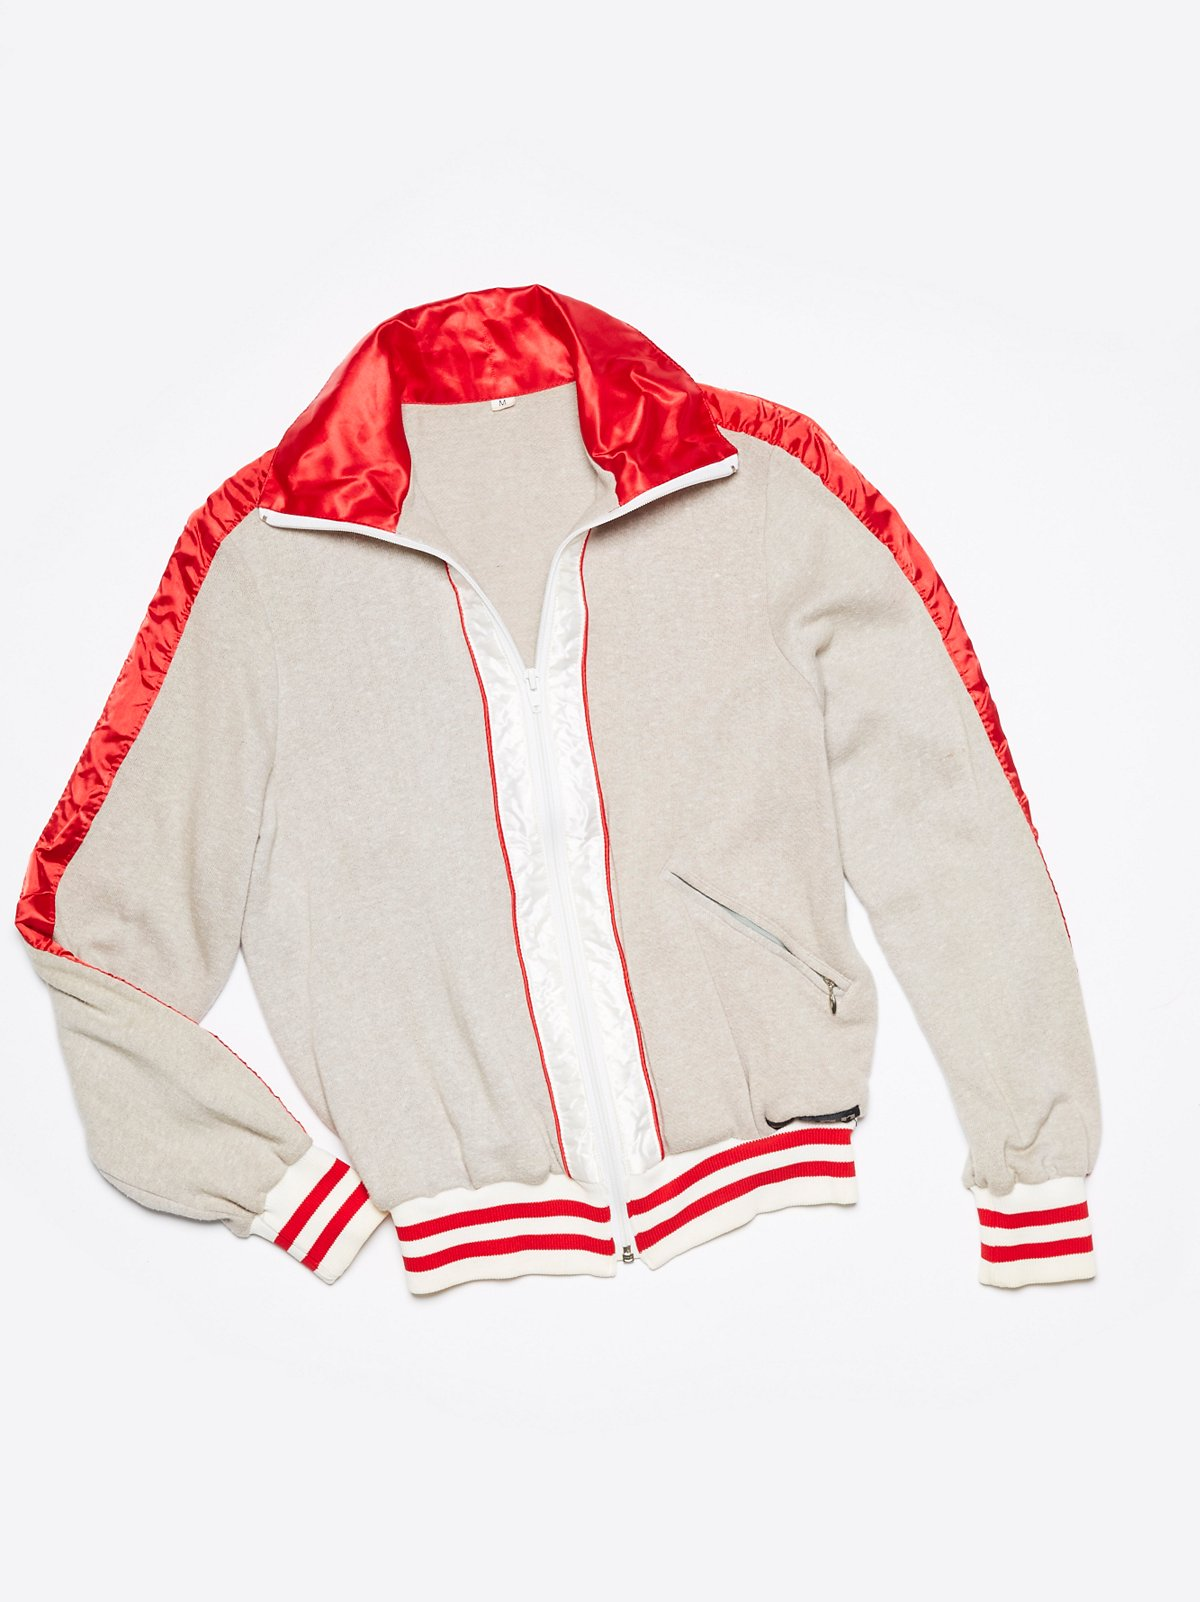 Vintage 1980s Track Jacket